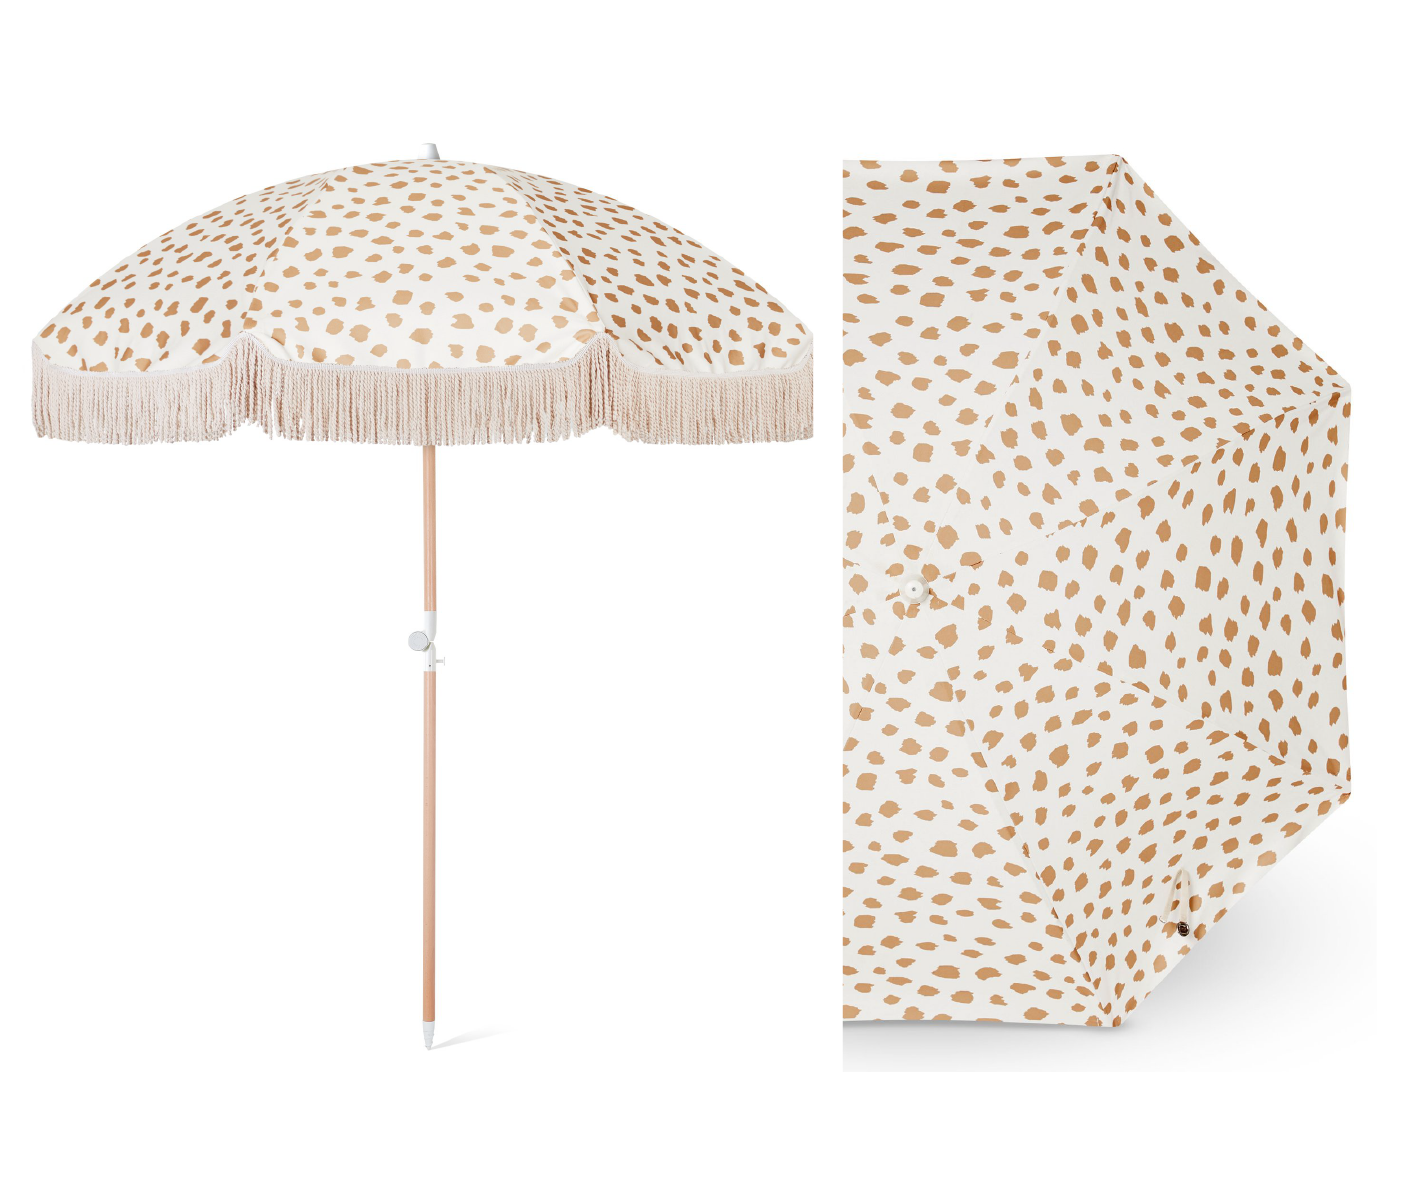 Golden Sands Beach Umbrella  - Official picture